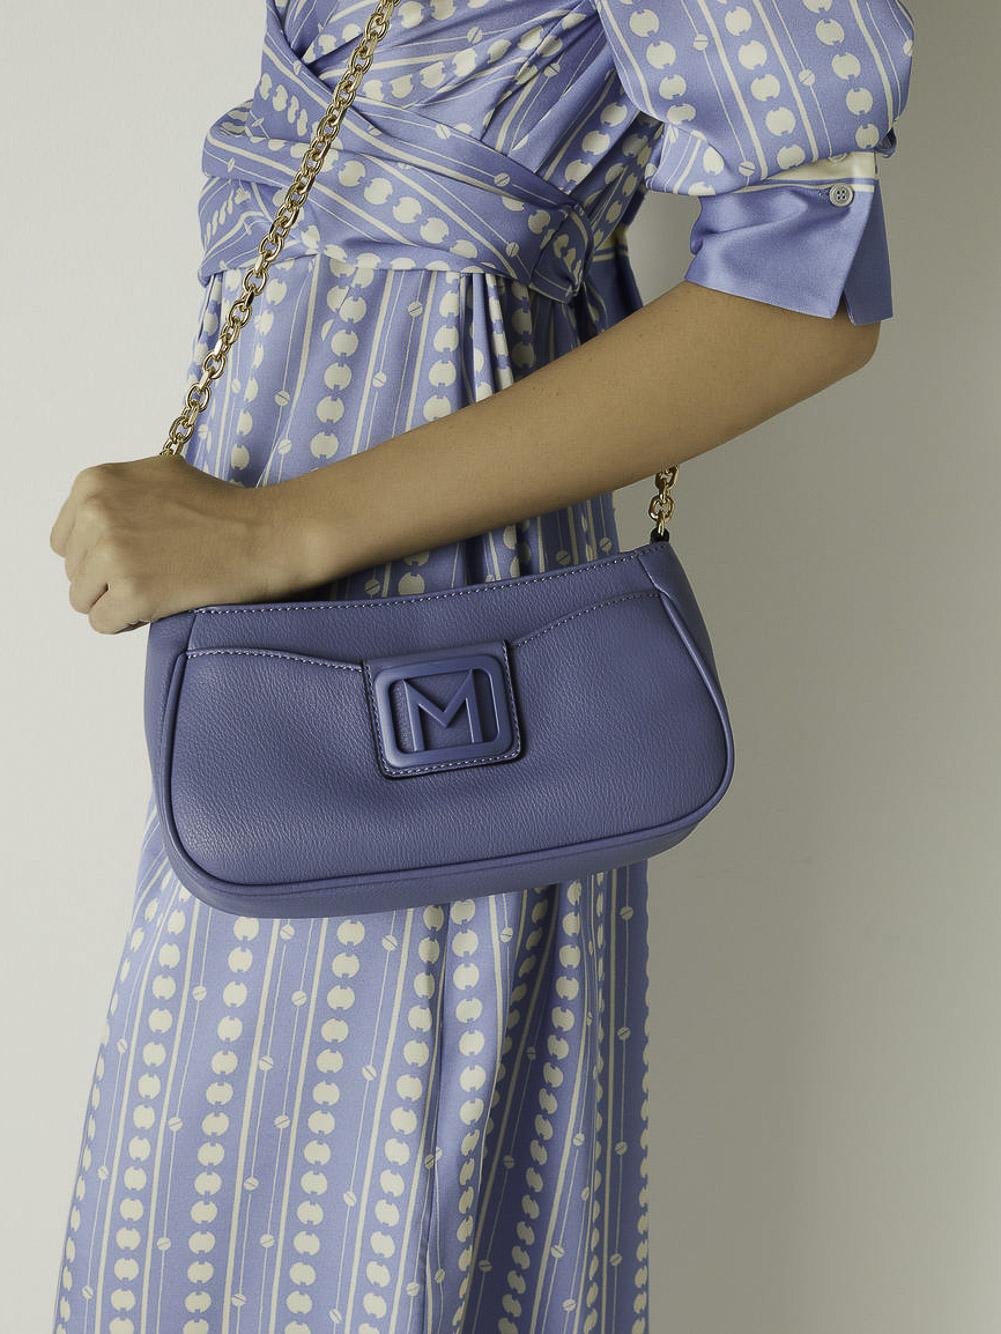 Marella Τσάντα DENNY 65111611 LIGHT BLUE